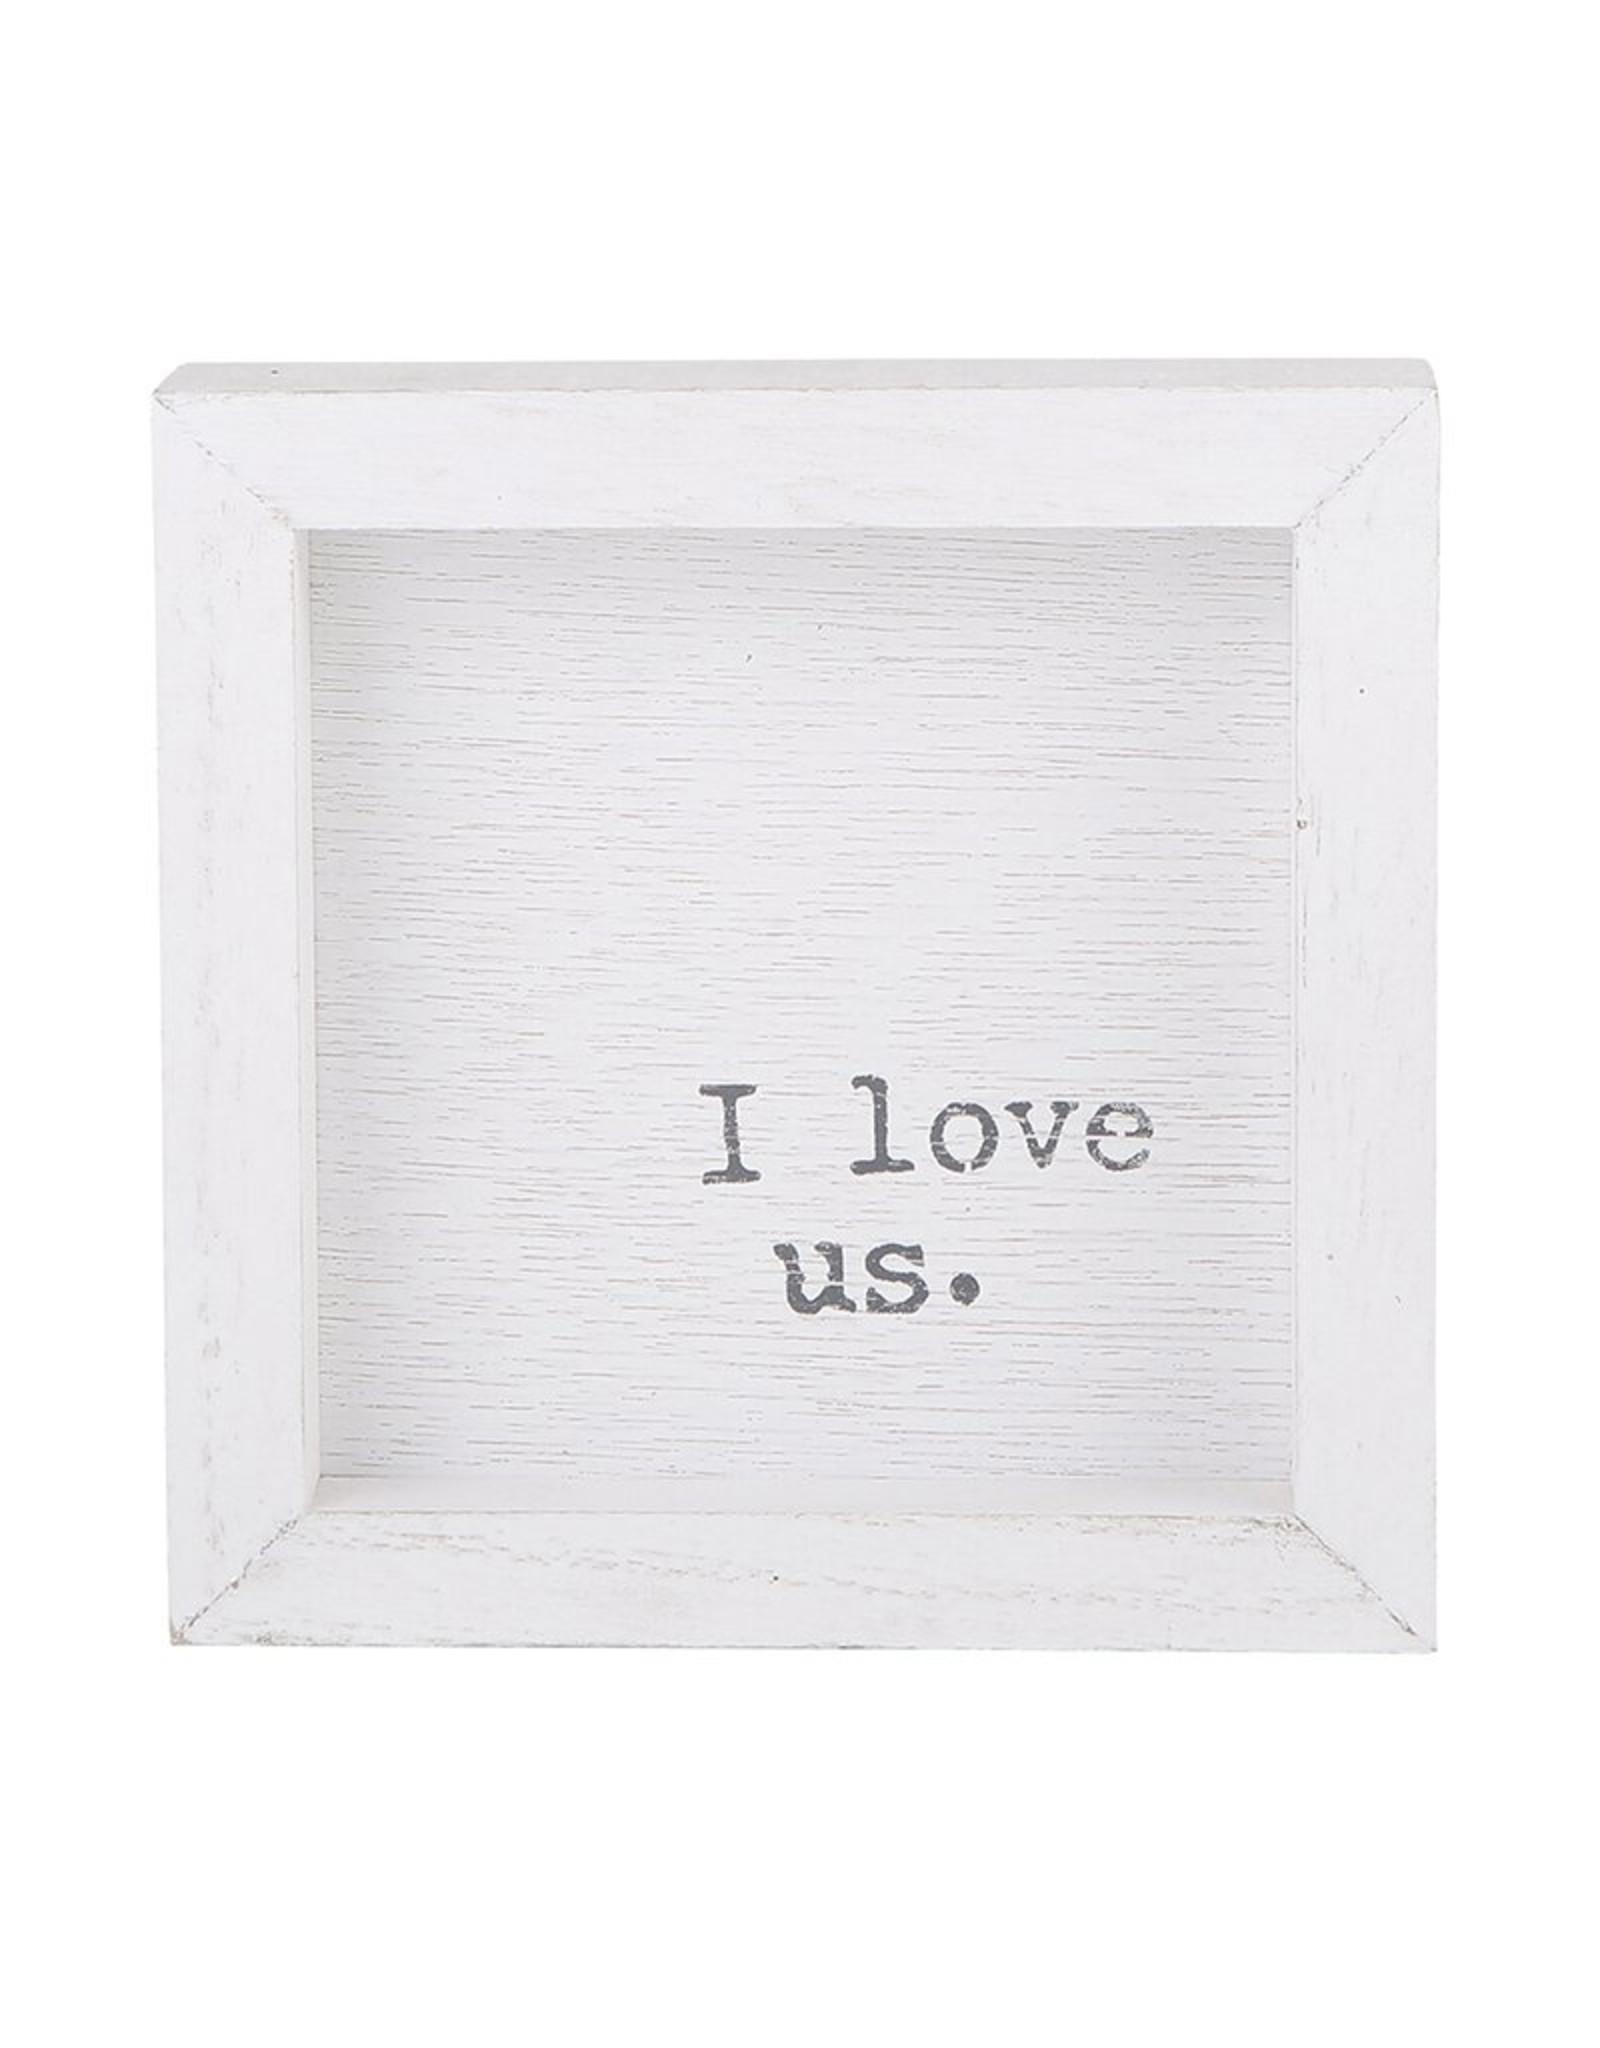 Wood Sign, I Love us, 6x6, white